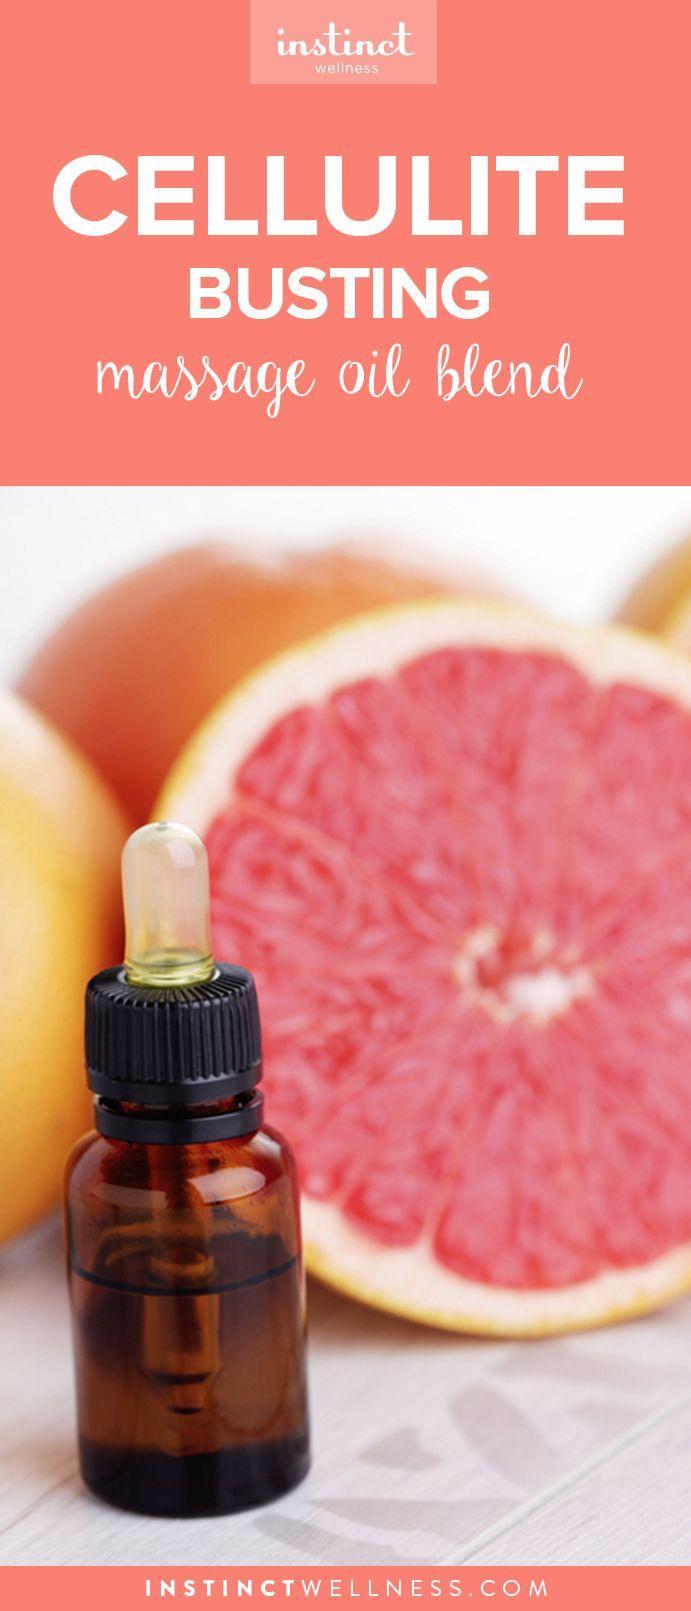 Easy DIY Grapefruit Cellulite Scrub Easy DIY Grapefruit Cellulite Scrub new pics